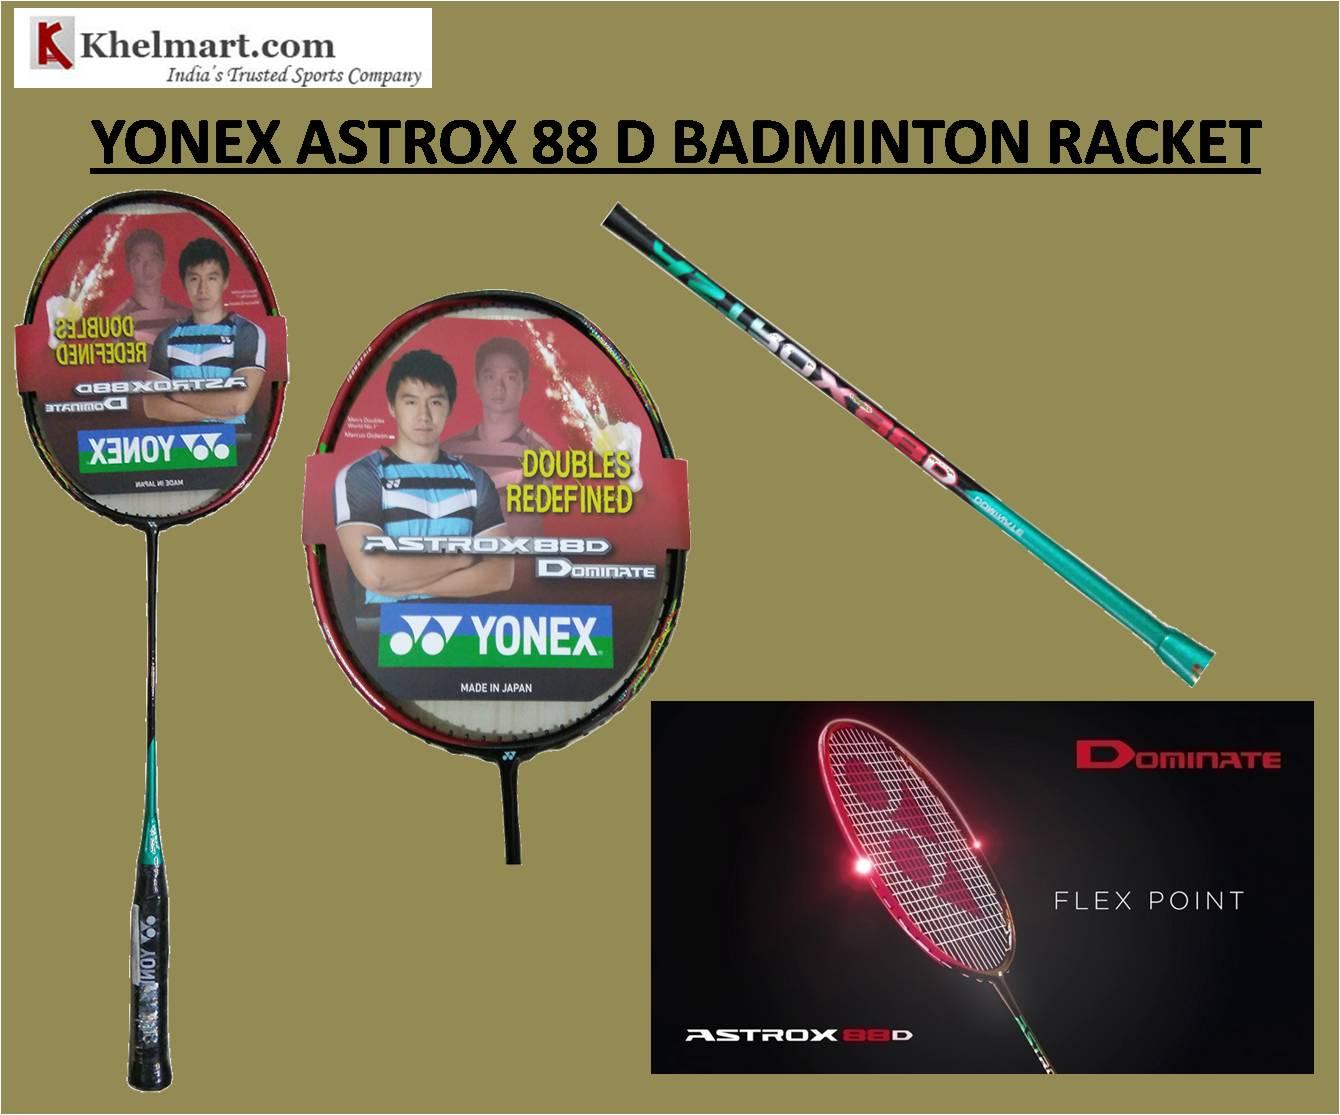 YONEX ASTROX 88 D BADMINTON RACKET